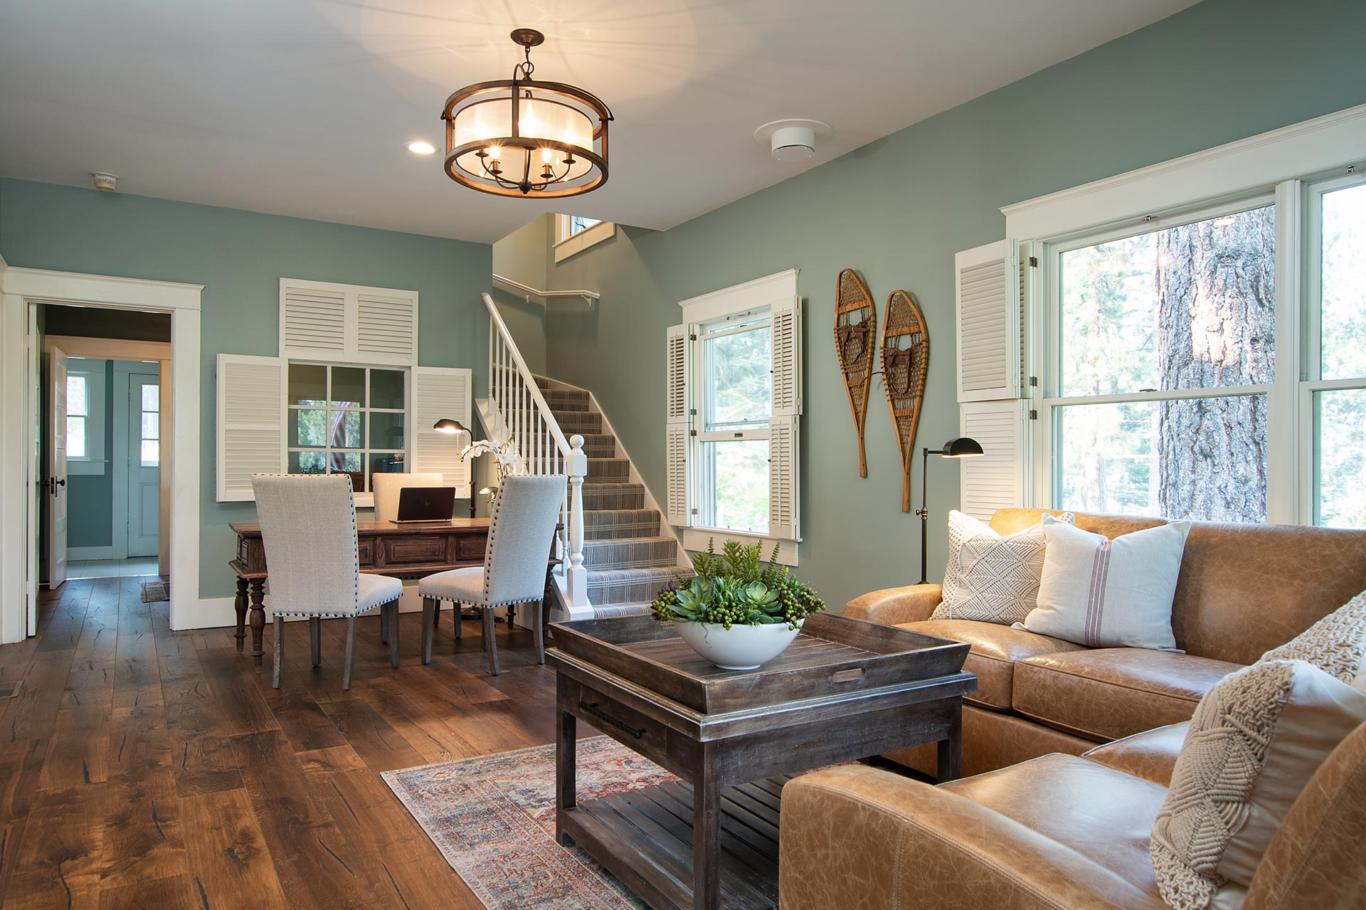 Pray Meadow Interior Design - South Lake Tahoe - Talie Jane Interiors